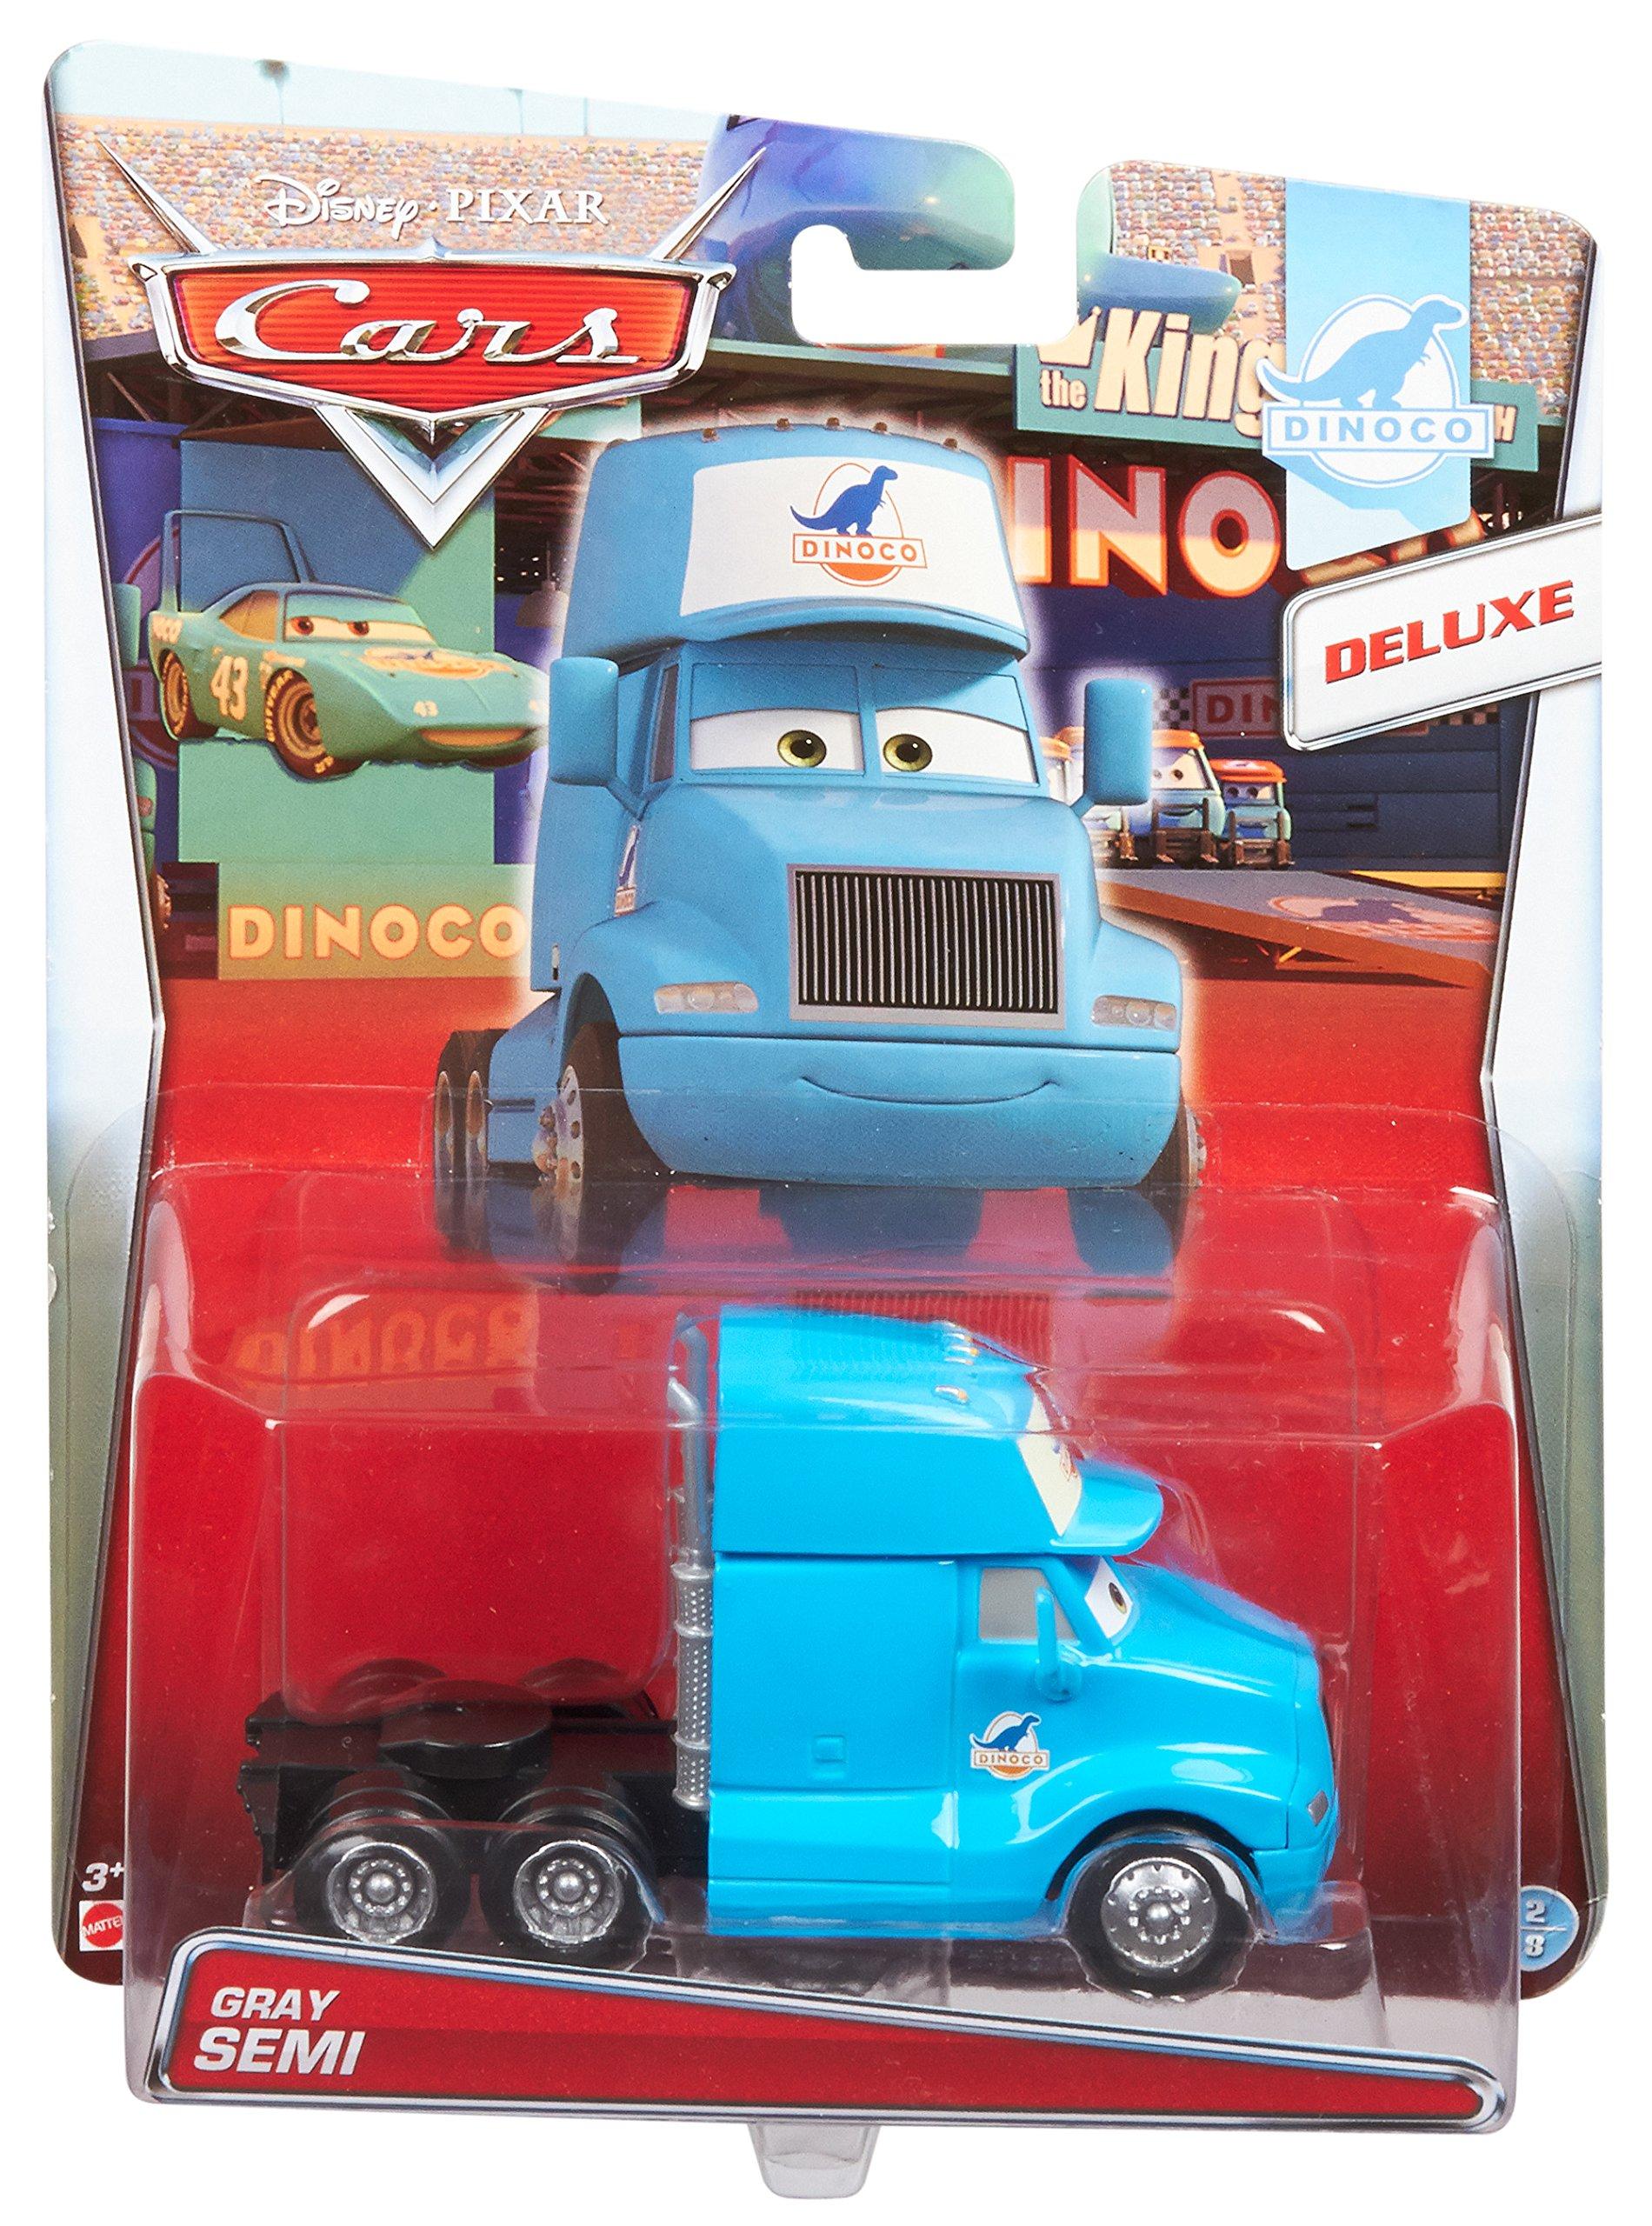 Disney Pixar Cars Deluxe Oversized Die-Cast Vehicle, Gray Semi